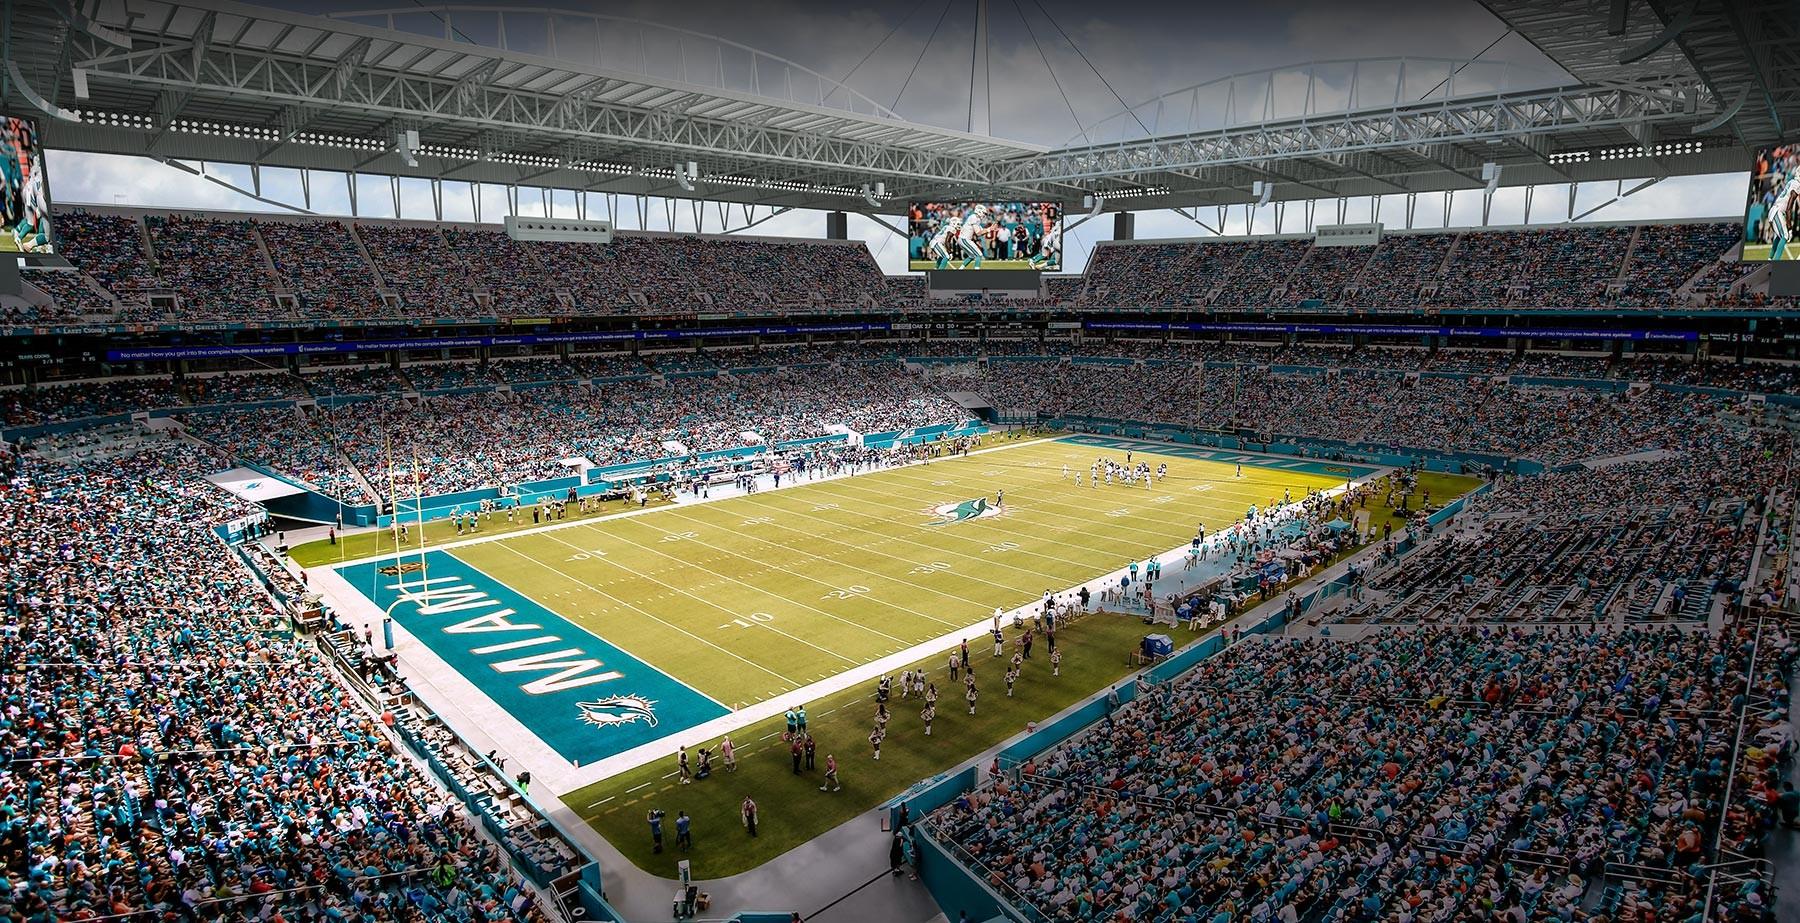 Philadelphia Eagles Wallpaper Hd Turf Installed At New Miami Stadium Football Stadium Digest